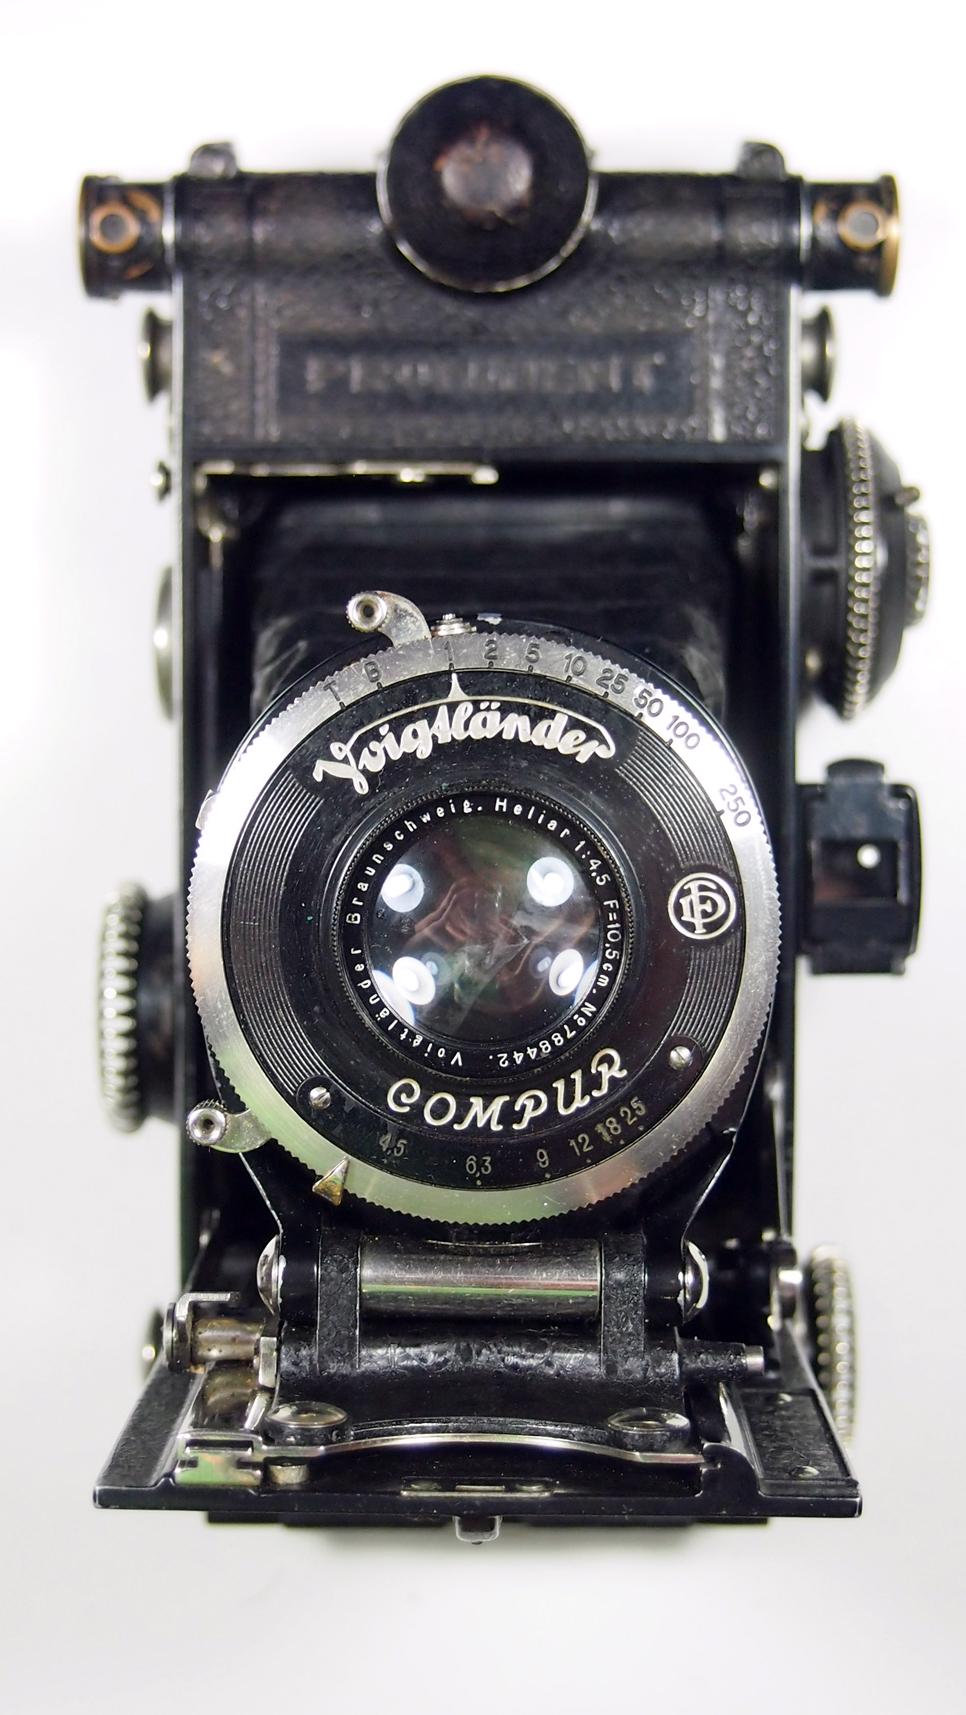 Voigt nder prominent 6 9 folding camera vintage camera for Camera camera camera